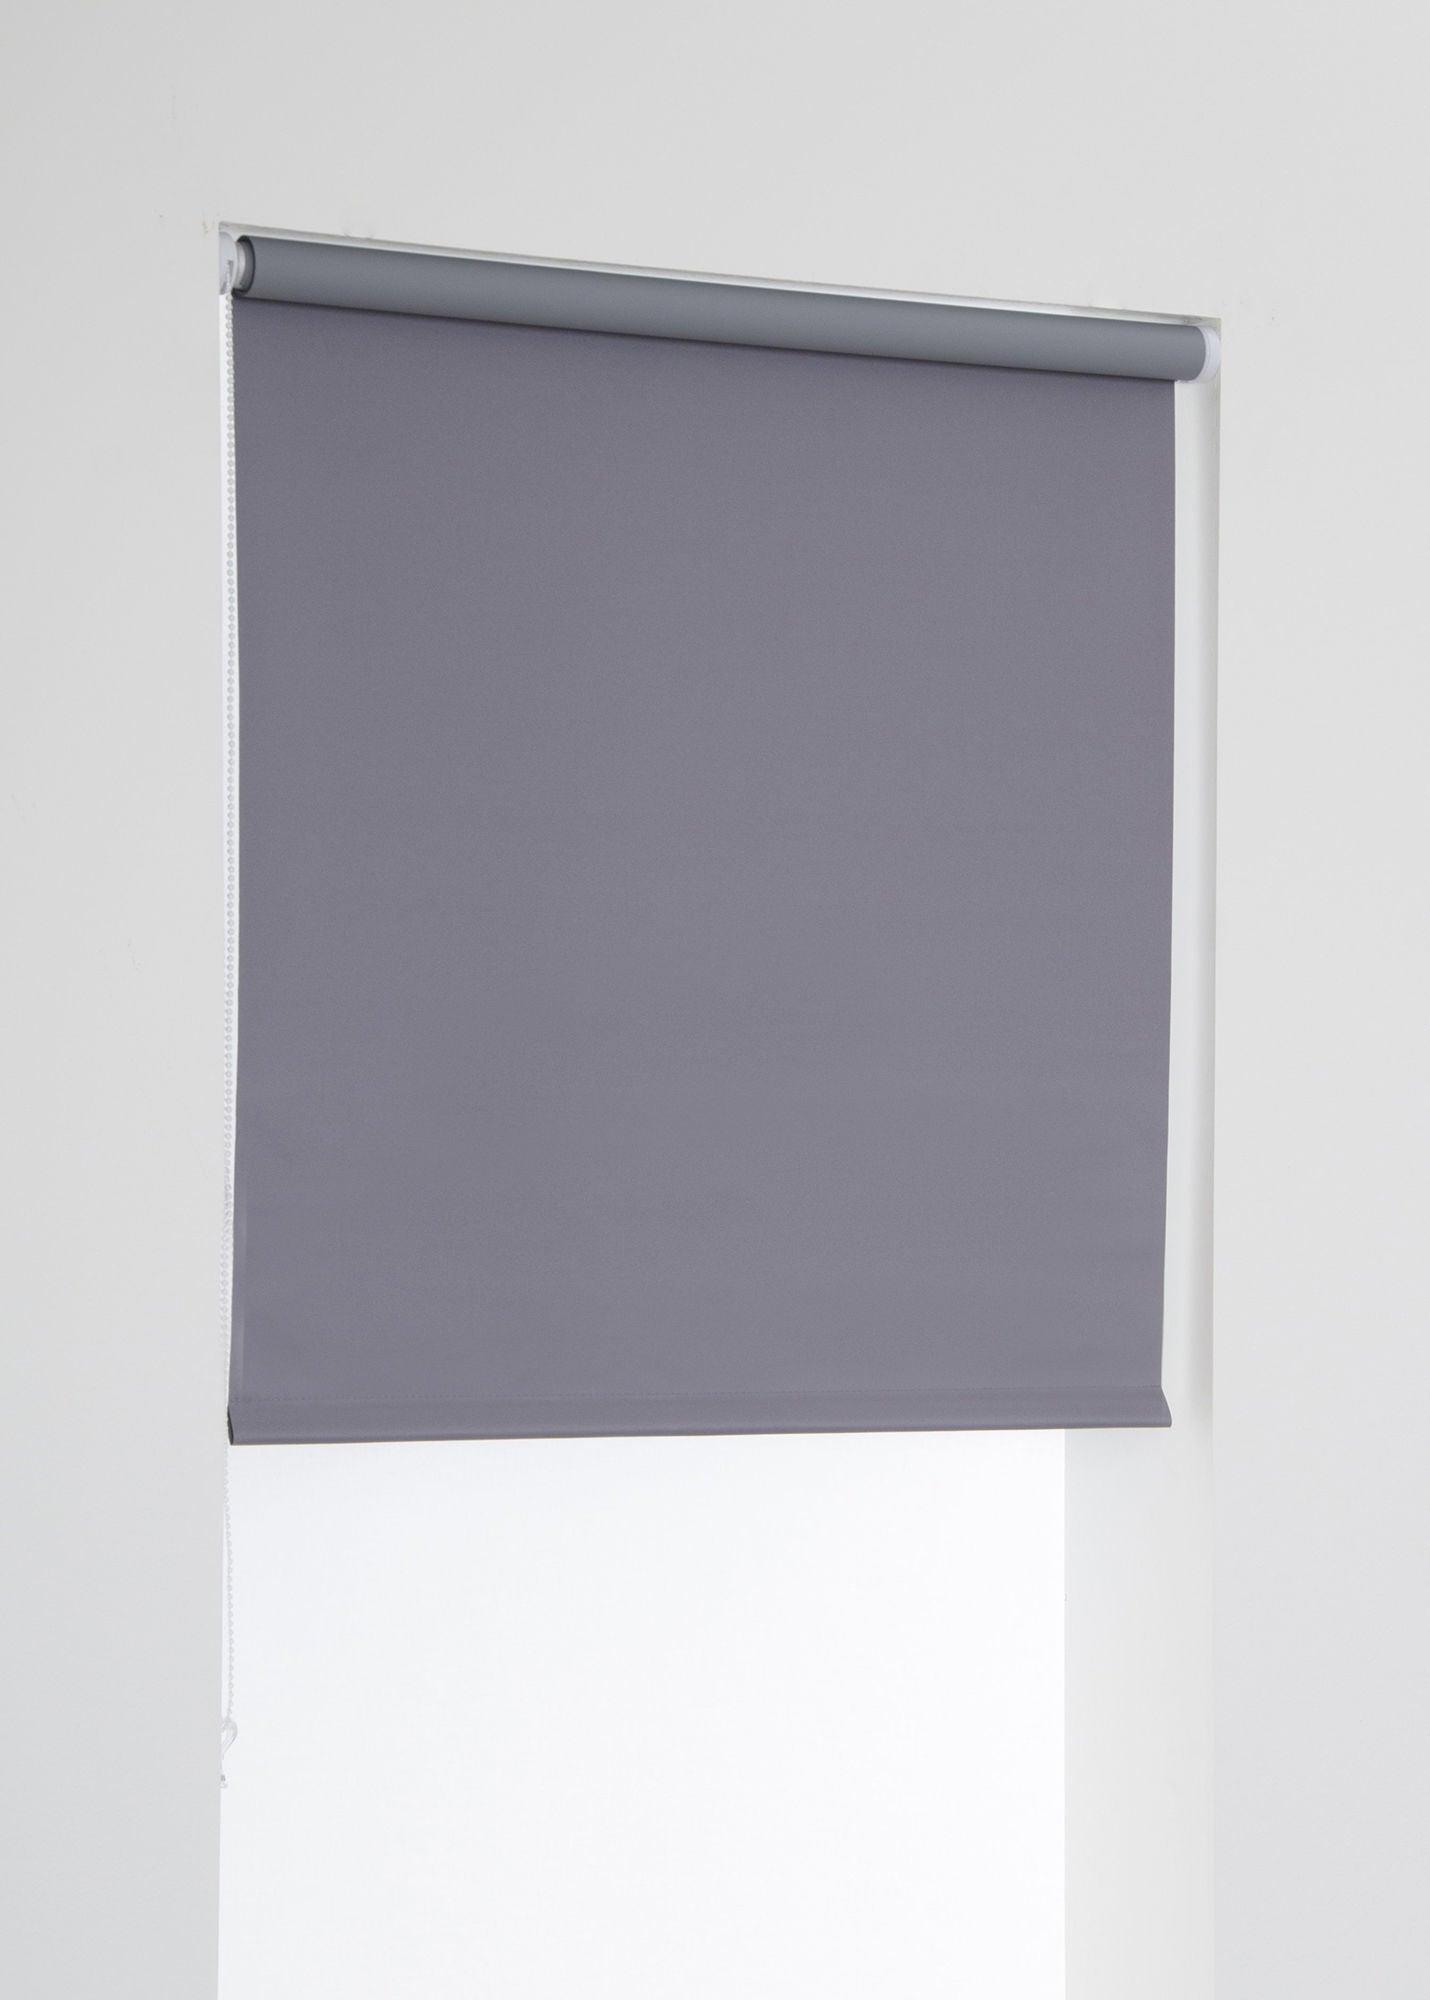 Hasta Blackout Pimennysverho, Grey 80x185